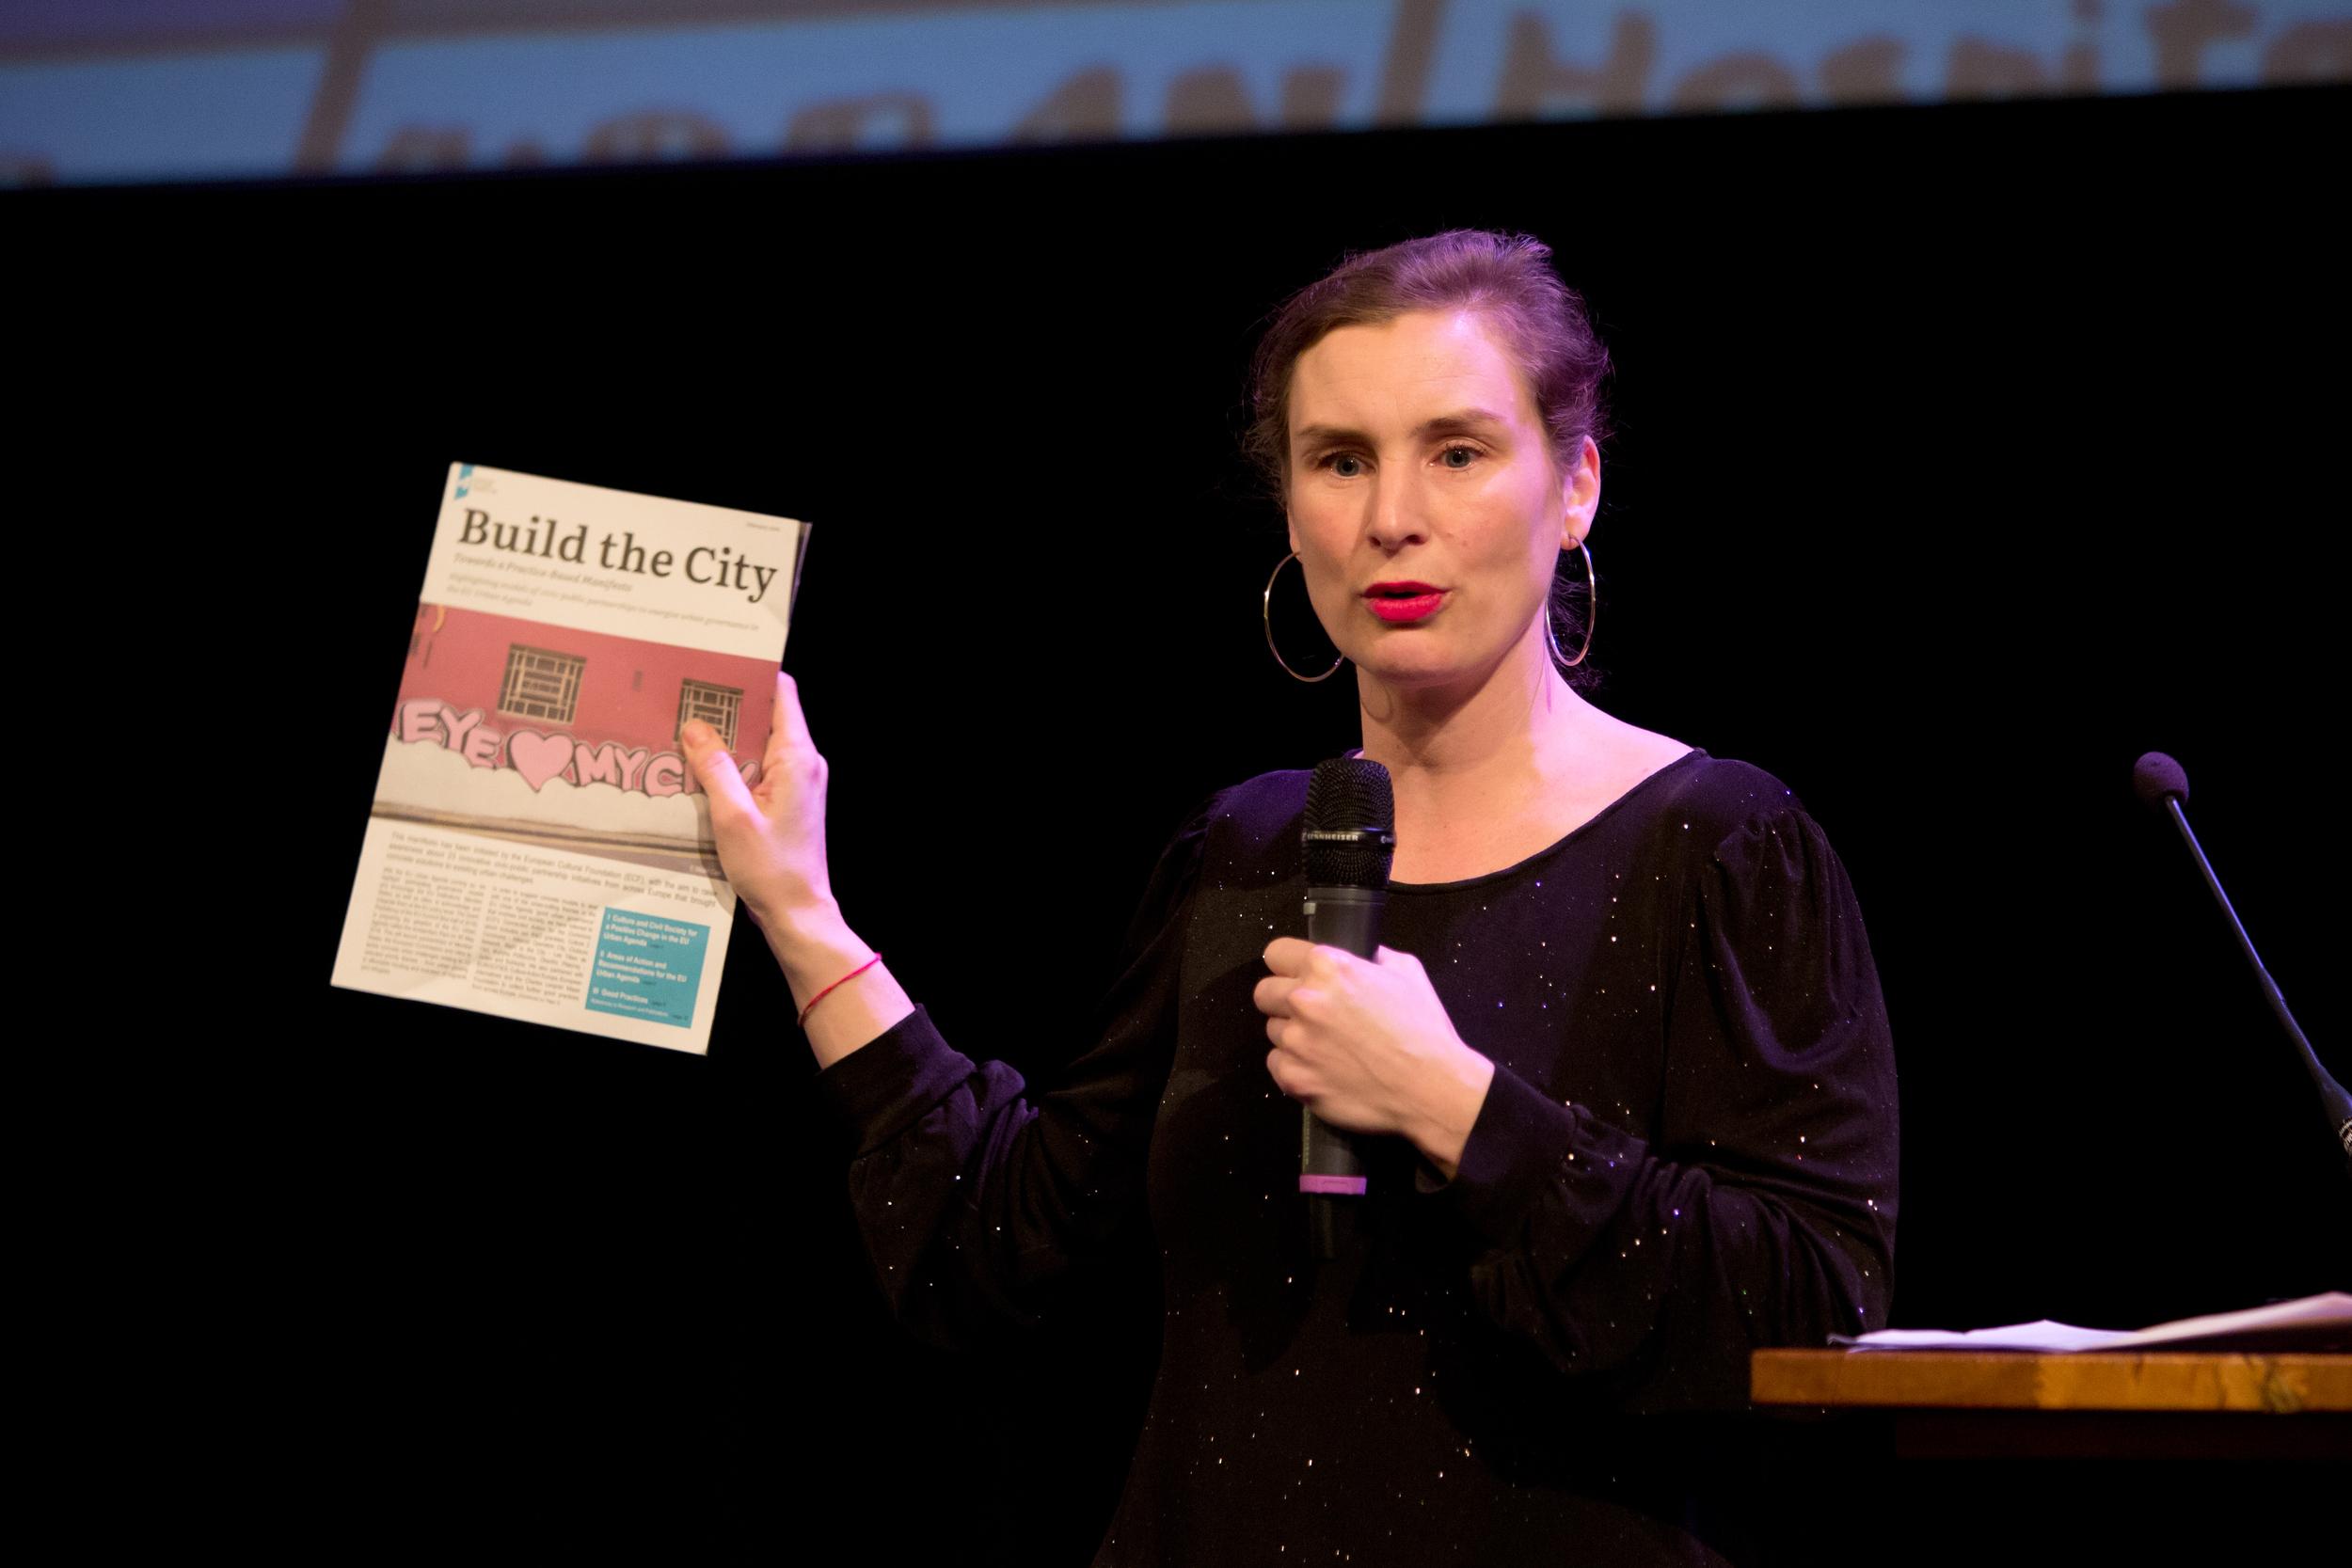 Moderator Natasja van den Berg holds the Build the City Manifesto.Photo by Maarten van Haaff.